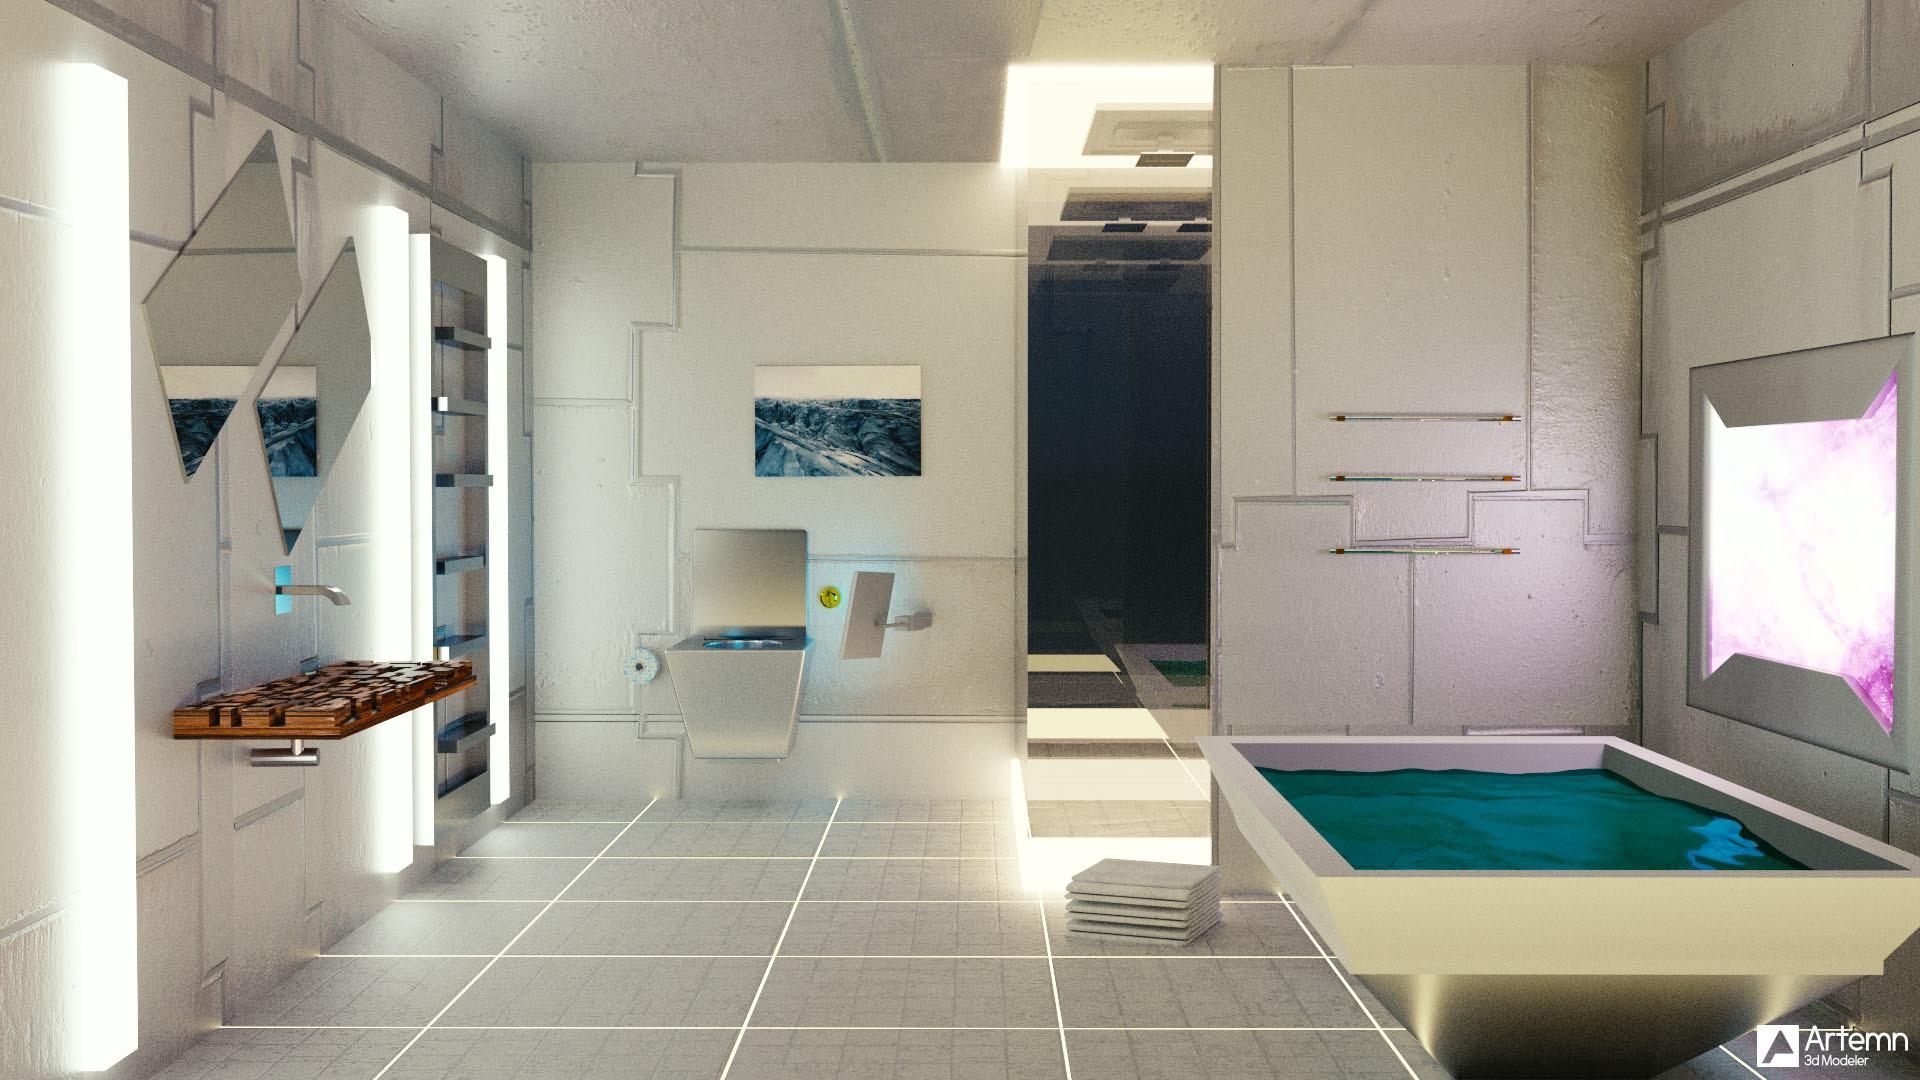 The Art of Trexminator - BlenderNation on Space Bathroom  id=80683